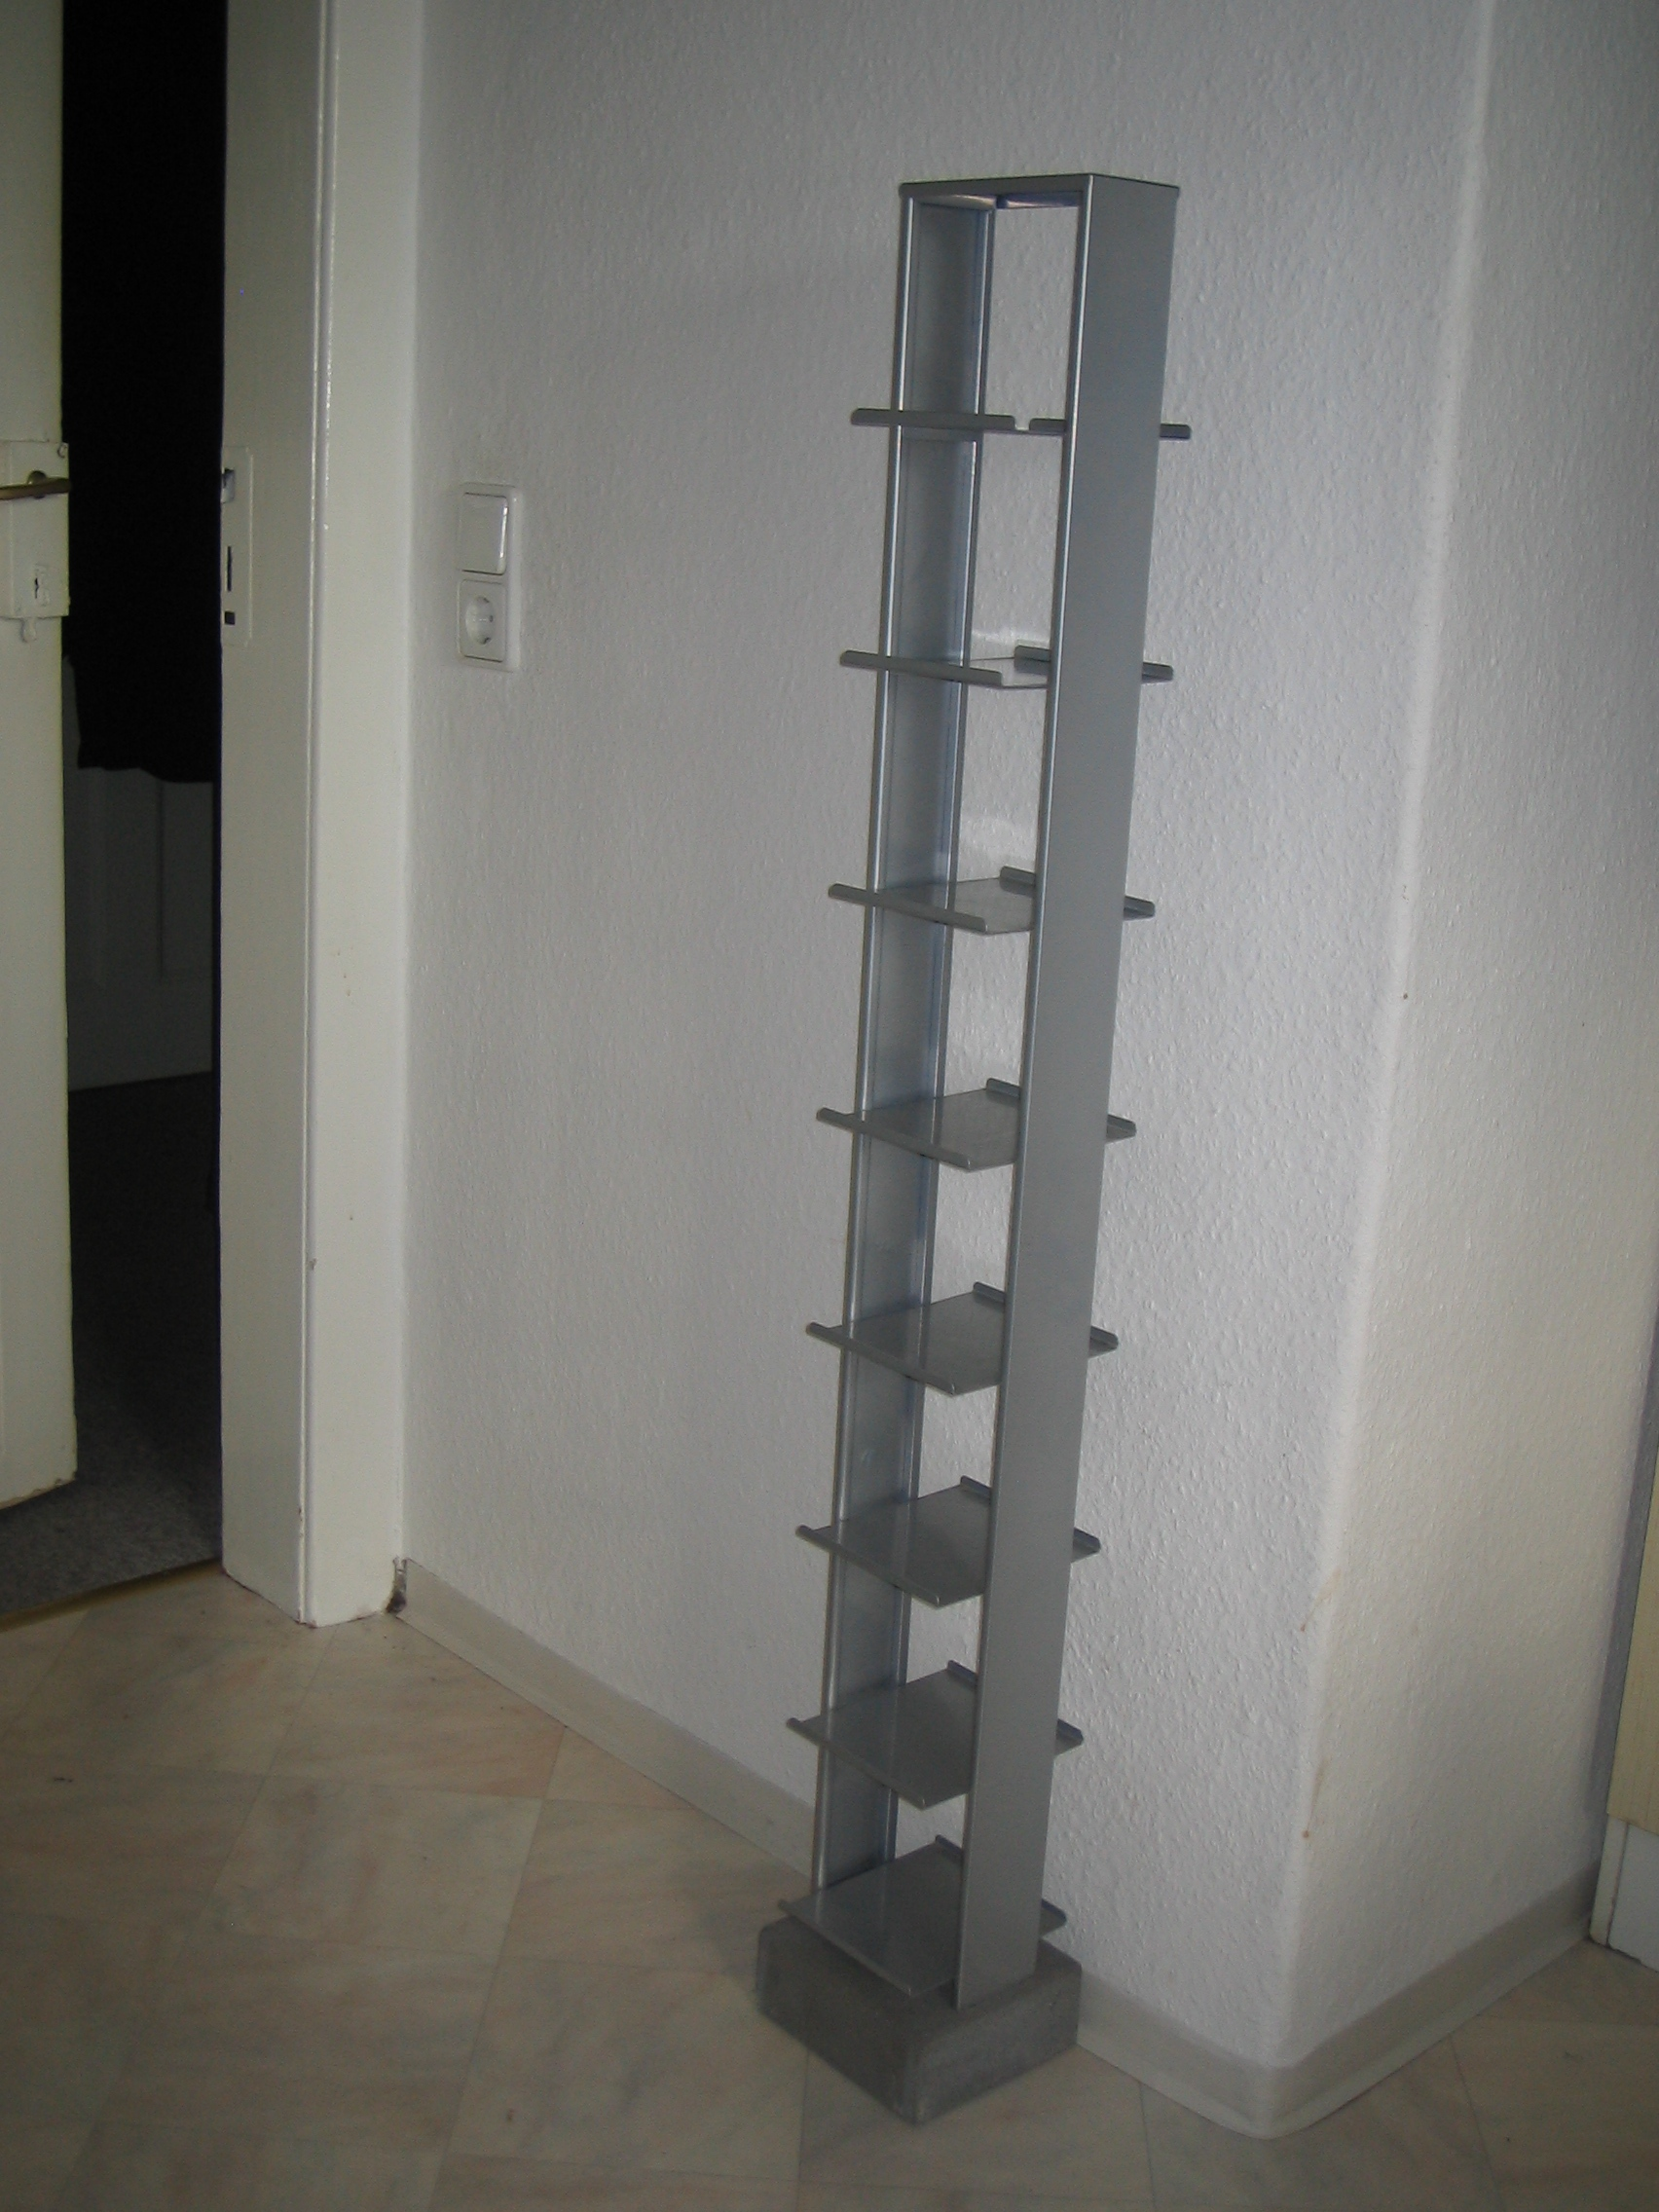 eXma » [beendet] IKEA CD-Ständer